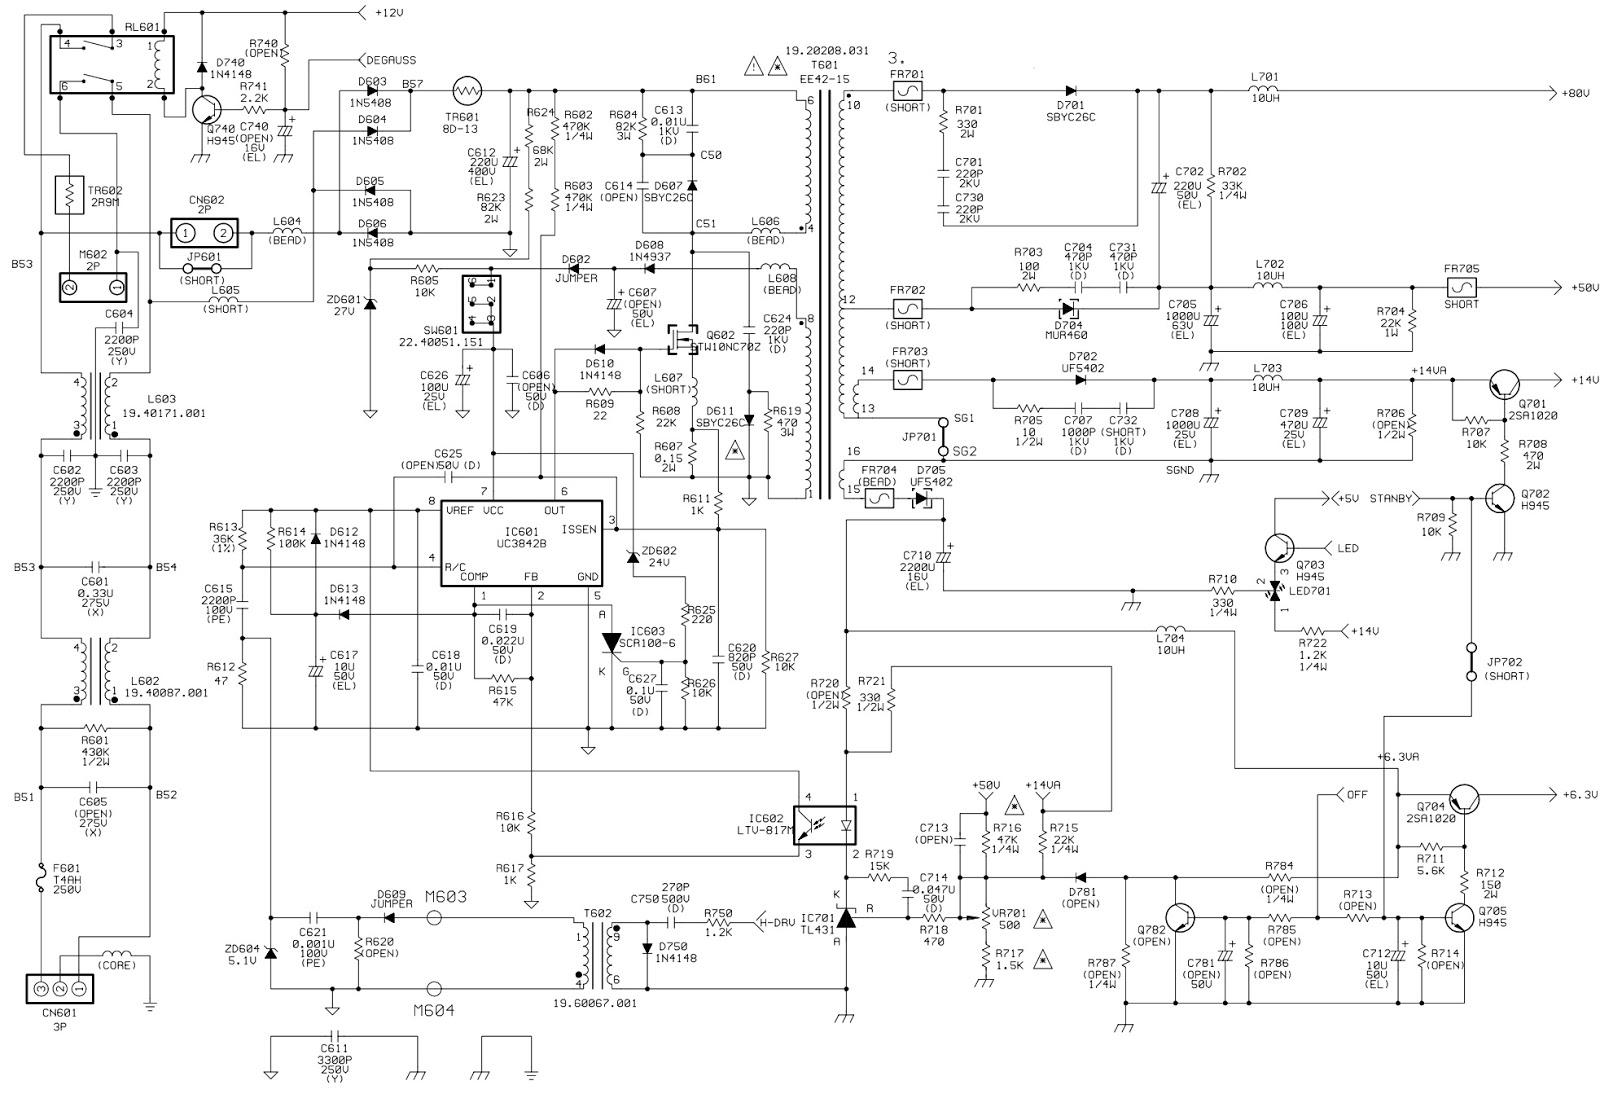 BenQ, Mitsubishi 1786FD2 Diamond View CRT Monitor – Circuit Diagram  Adjustments  Troubleshooting